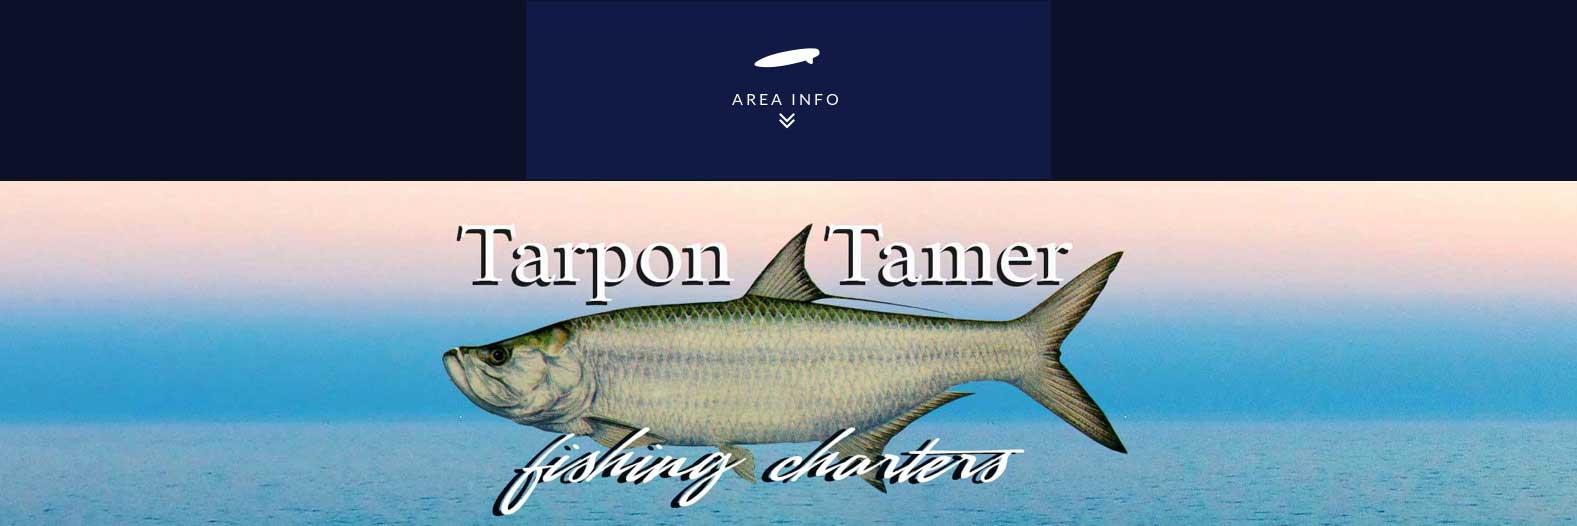 Tarpon Tamer Fishing Charters Area Info